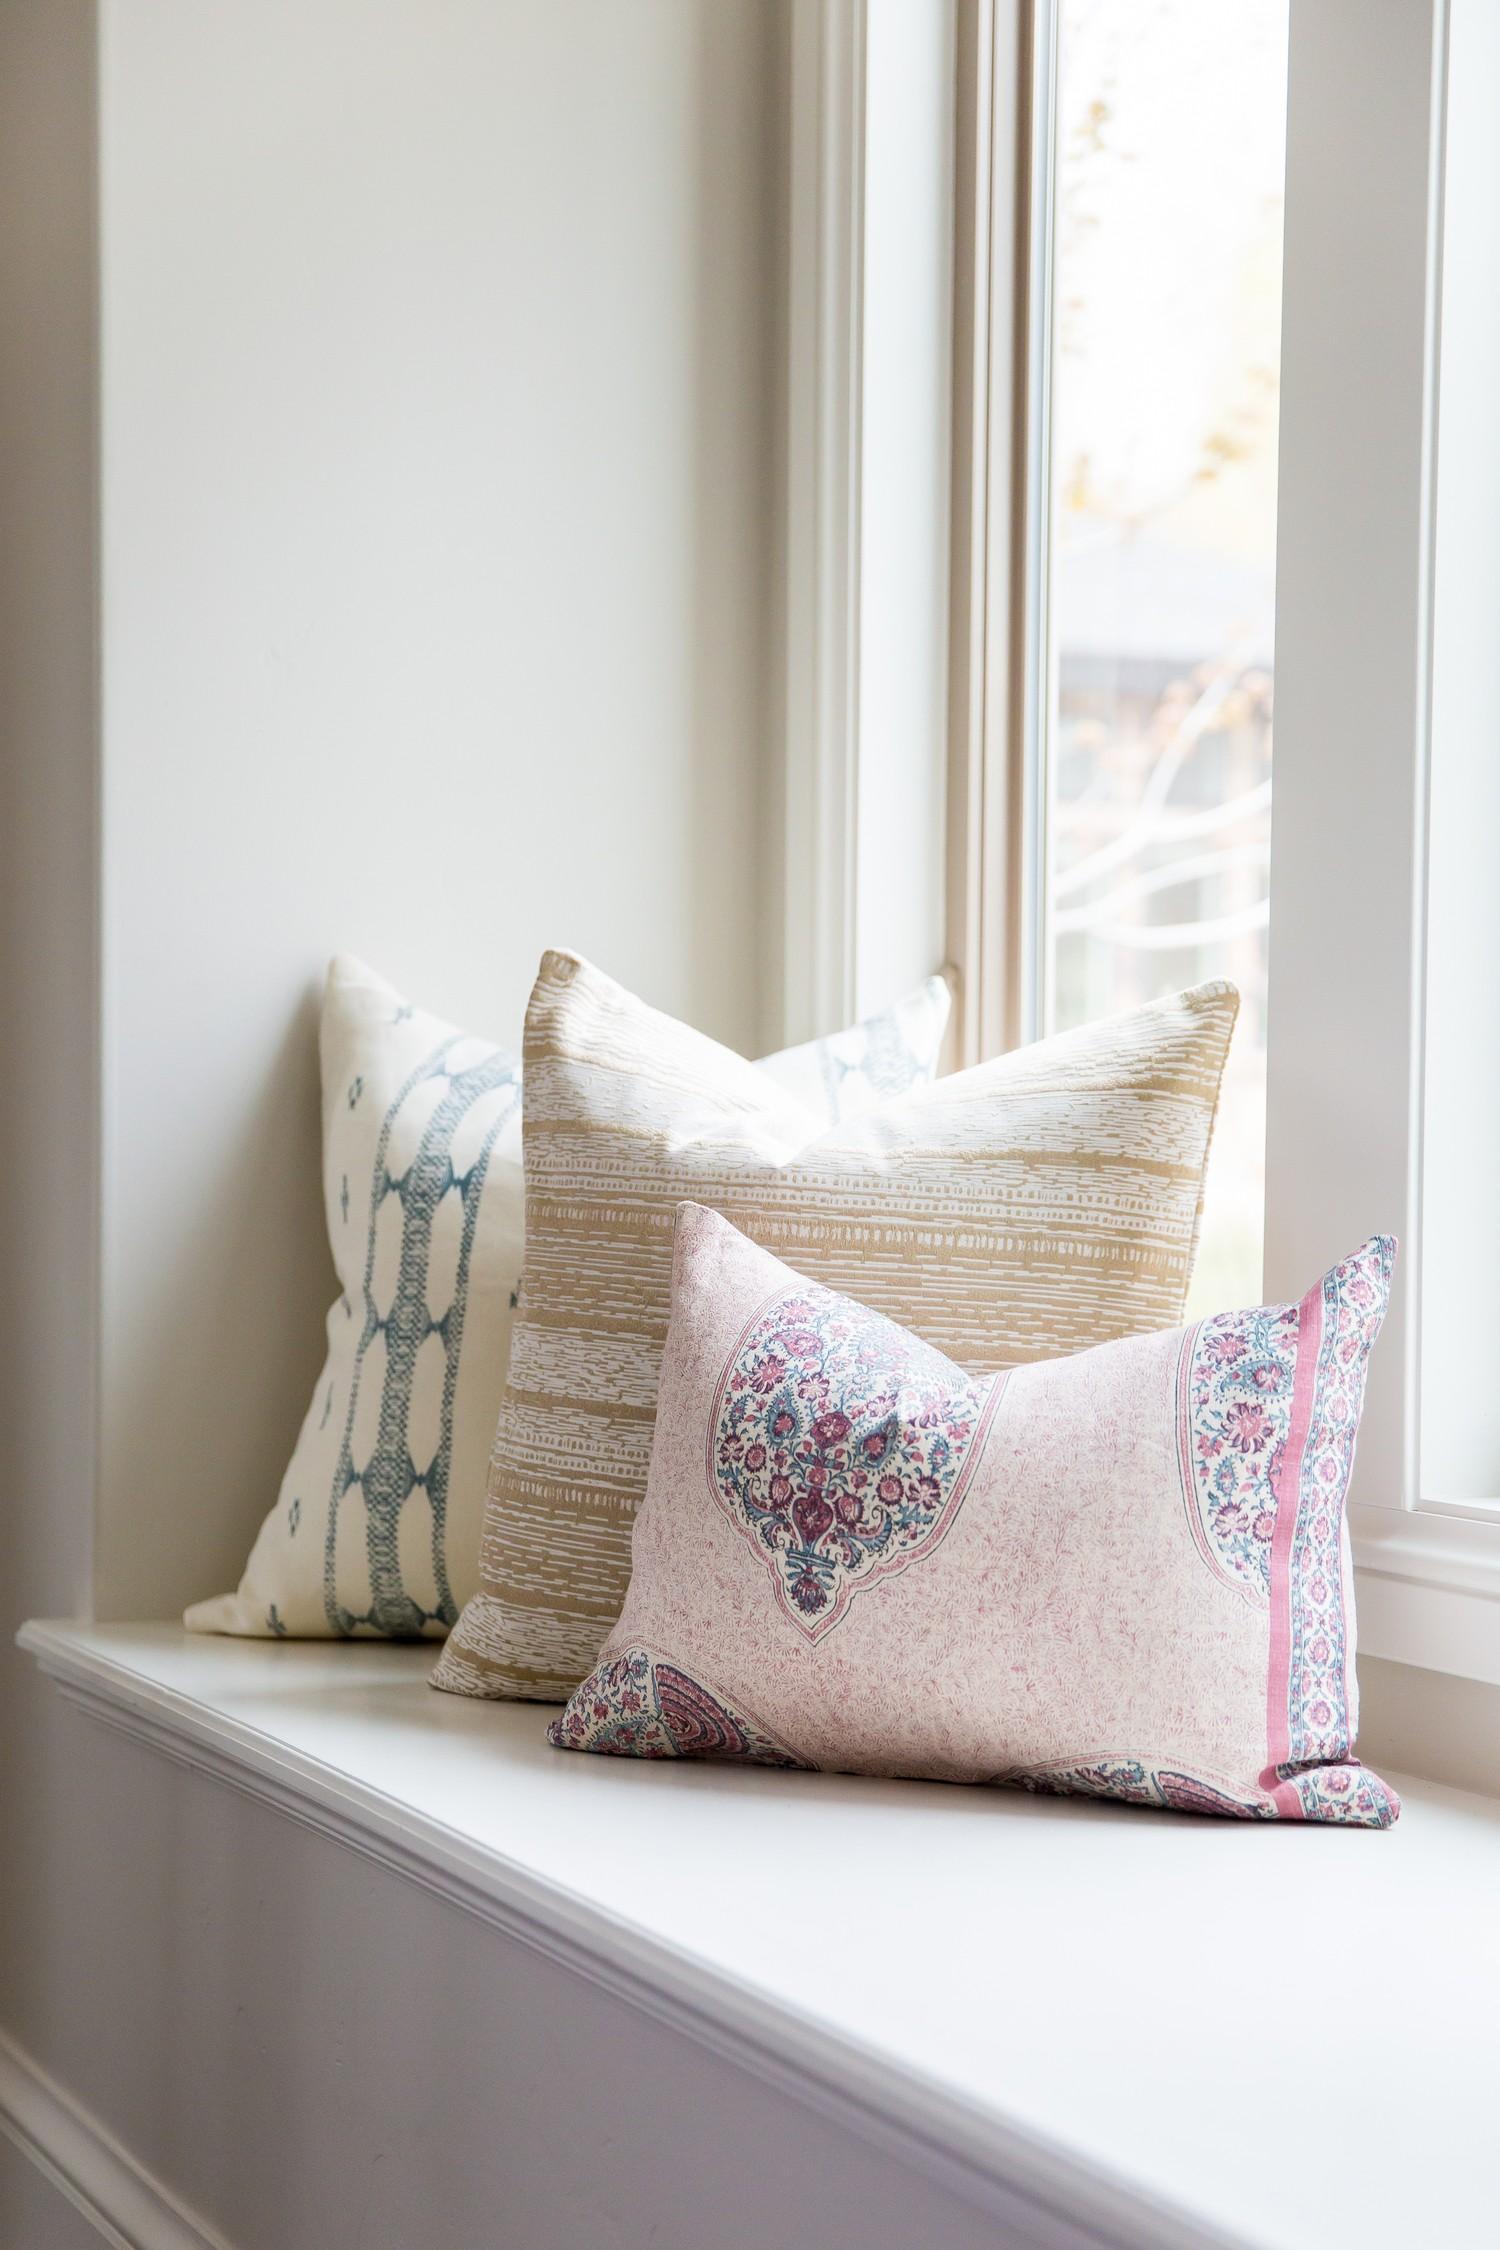 Window+seat+pillows+__+Studio+McGee.jpg